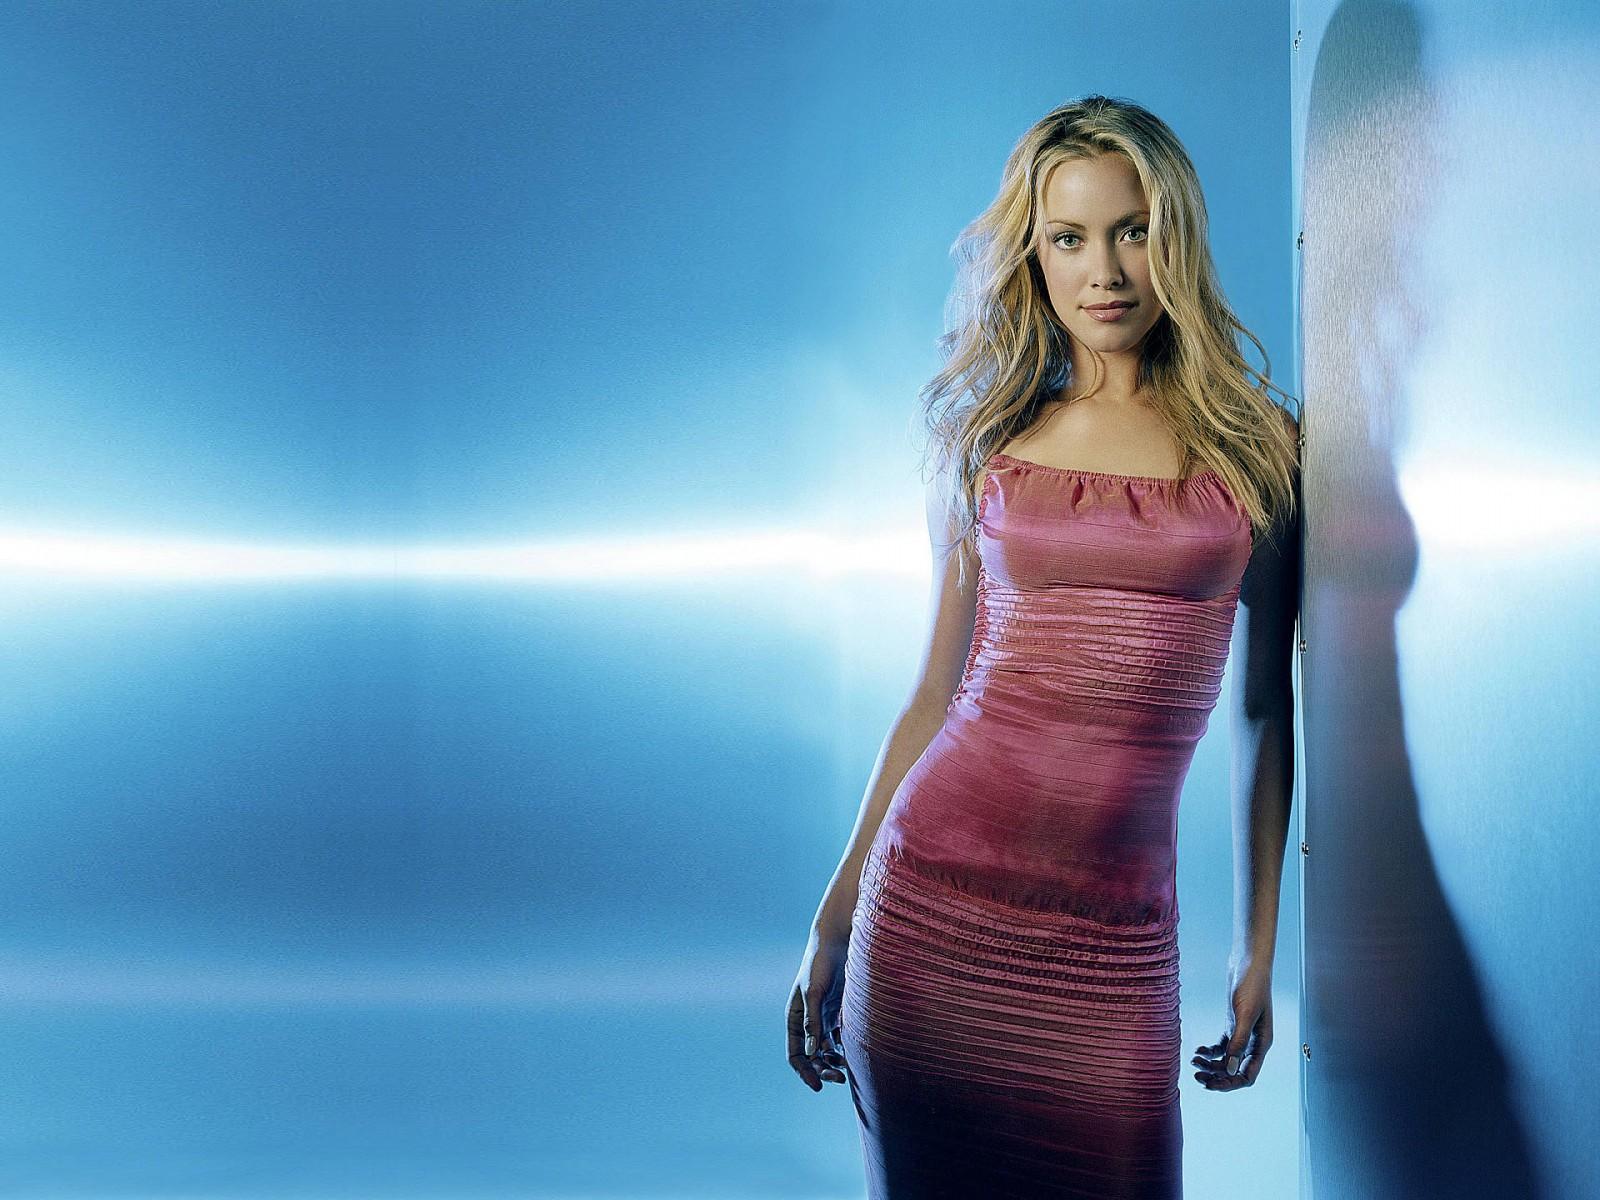 Cute Actress Wallpapers Download Terminator 3 Actress Kristanna Loken Wallpapers Hd